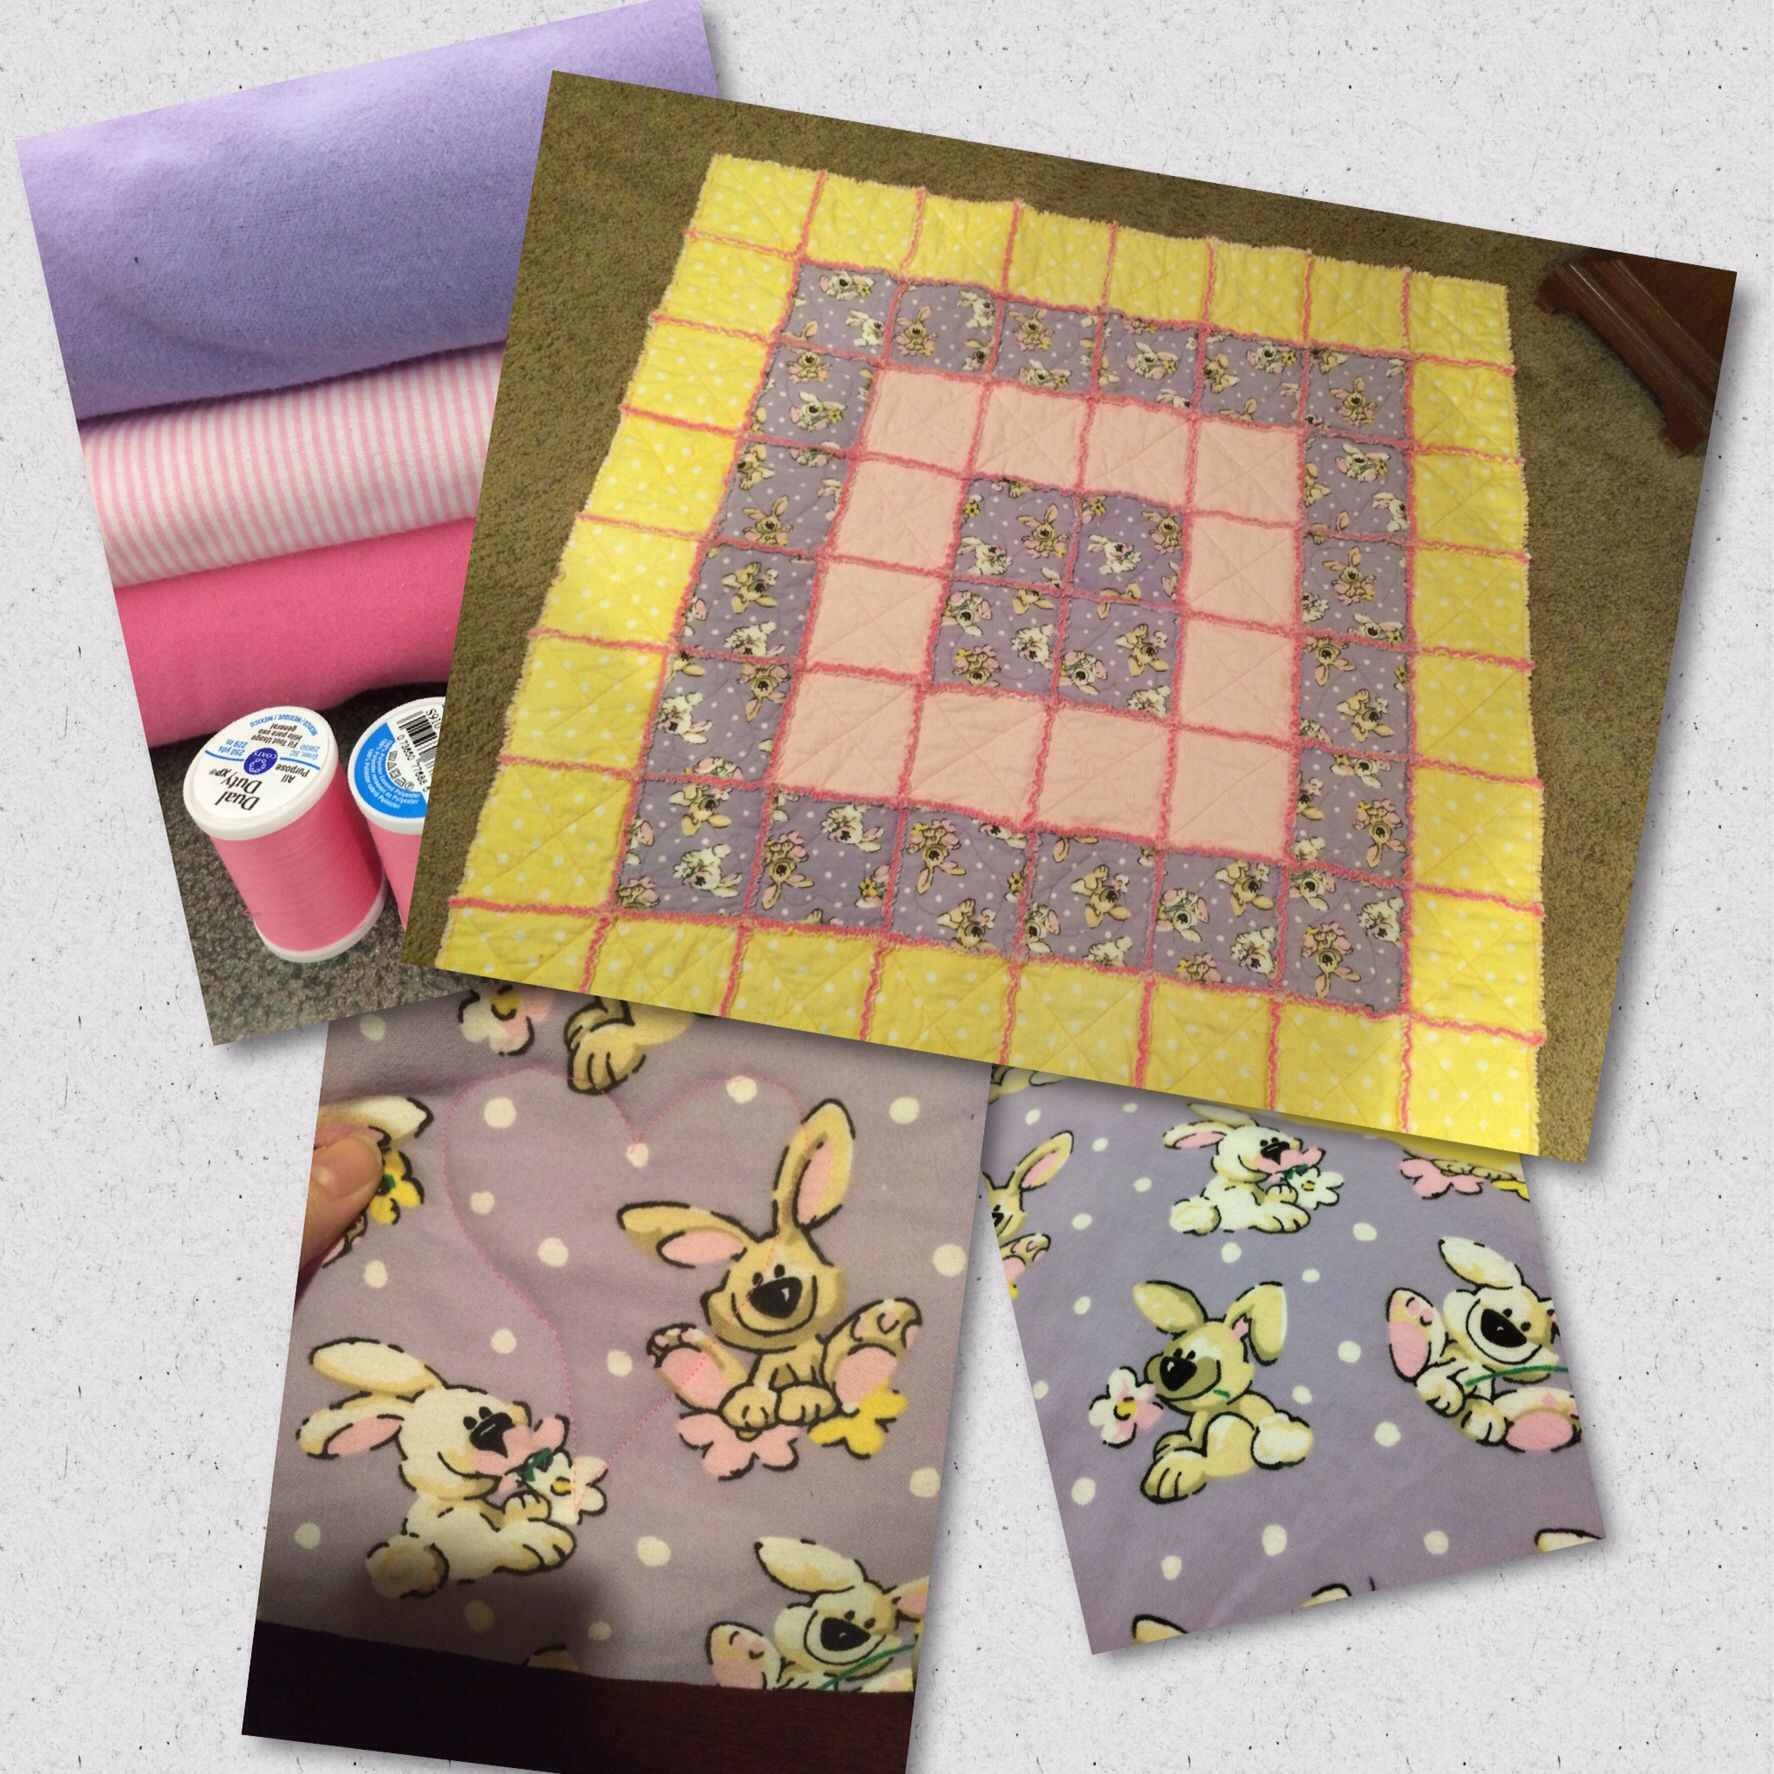 Cecelia's Bunny tummy time quilt 2015